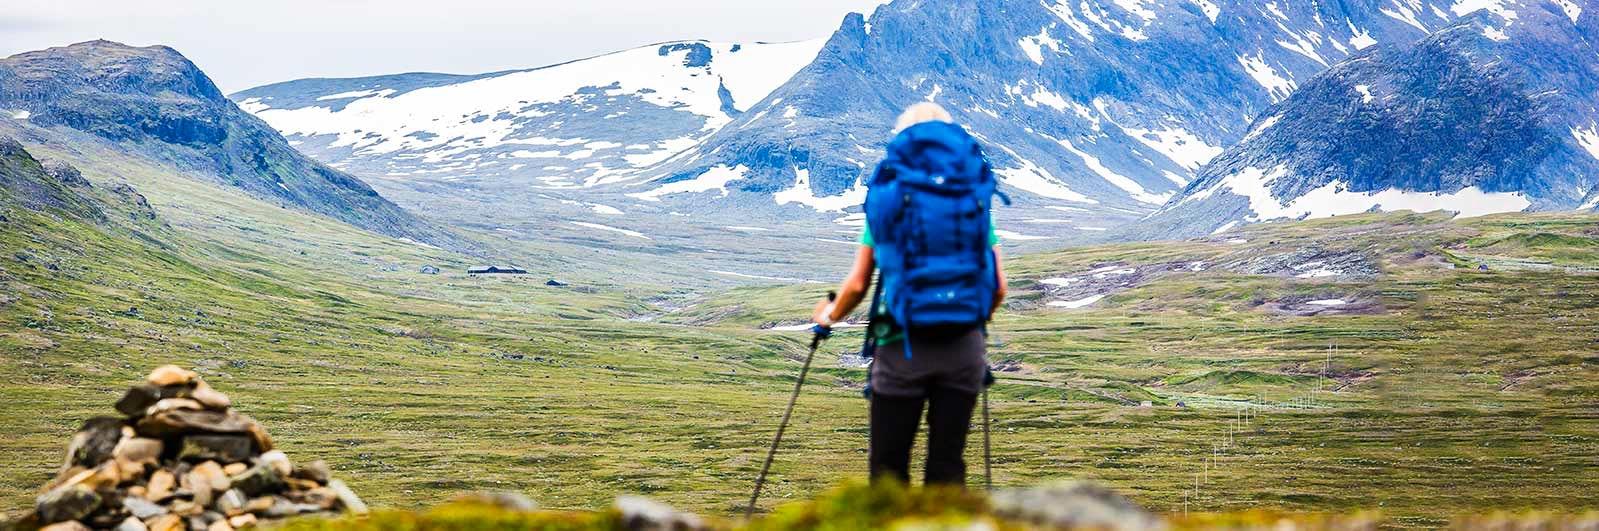 Hiker with blue rucksack in Jämtland